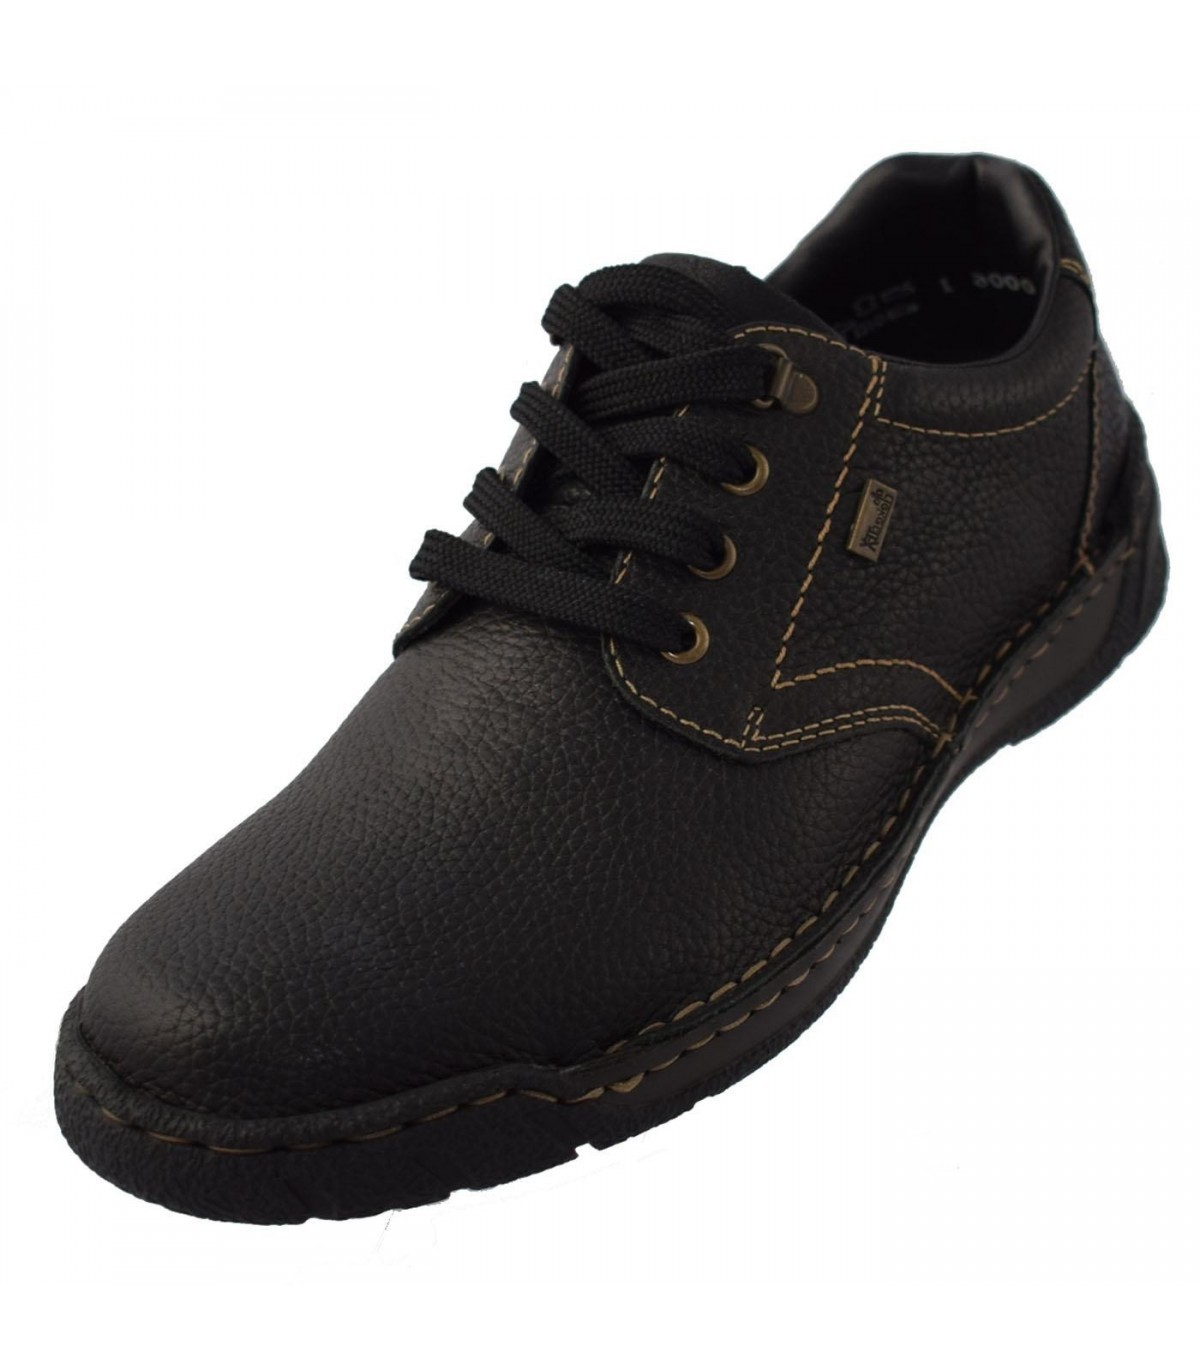 Pantofi Barbati Rieker 06357 Negru